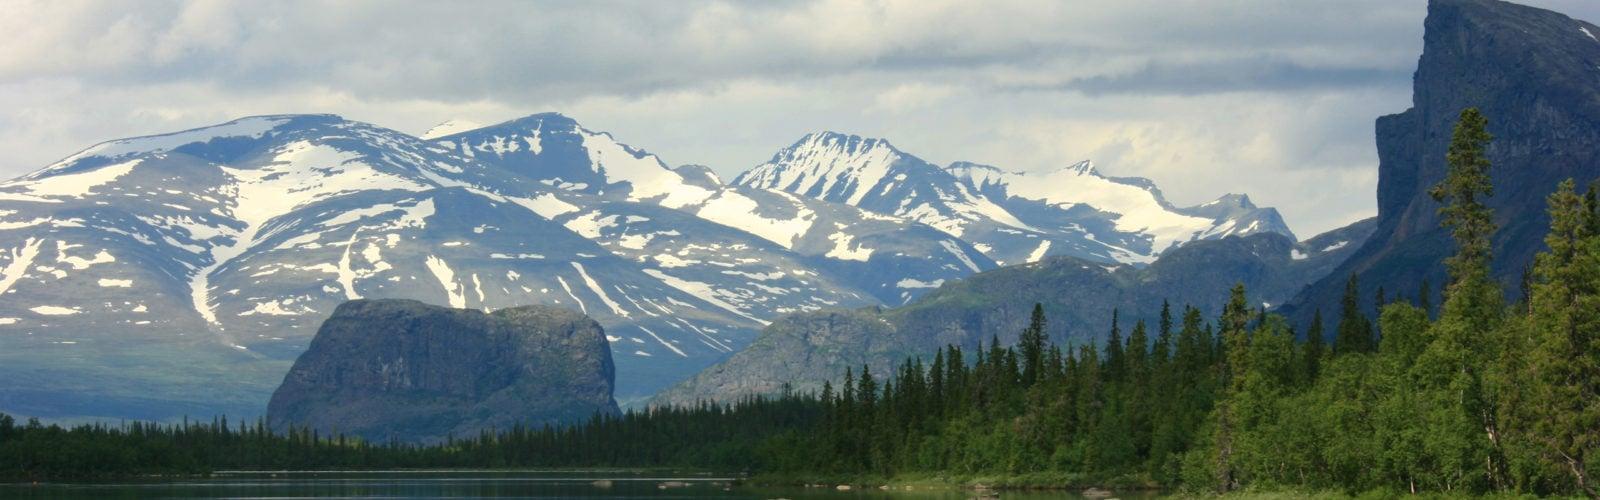 Swedish-Lapland-lake-mountain